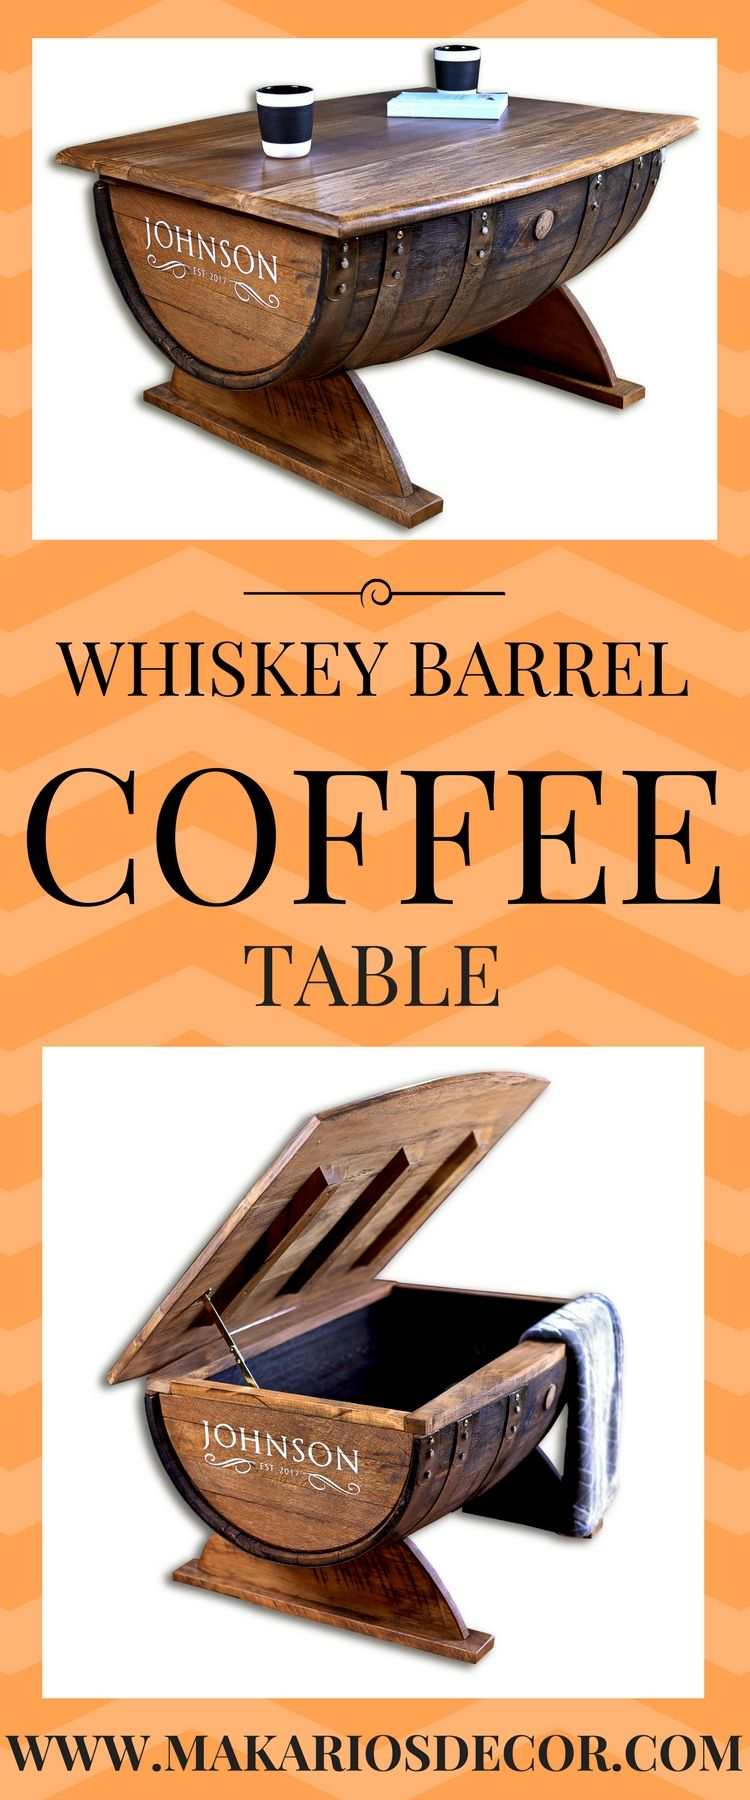 43+ Wine barrel coffee table canada ideas in 2021